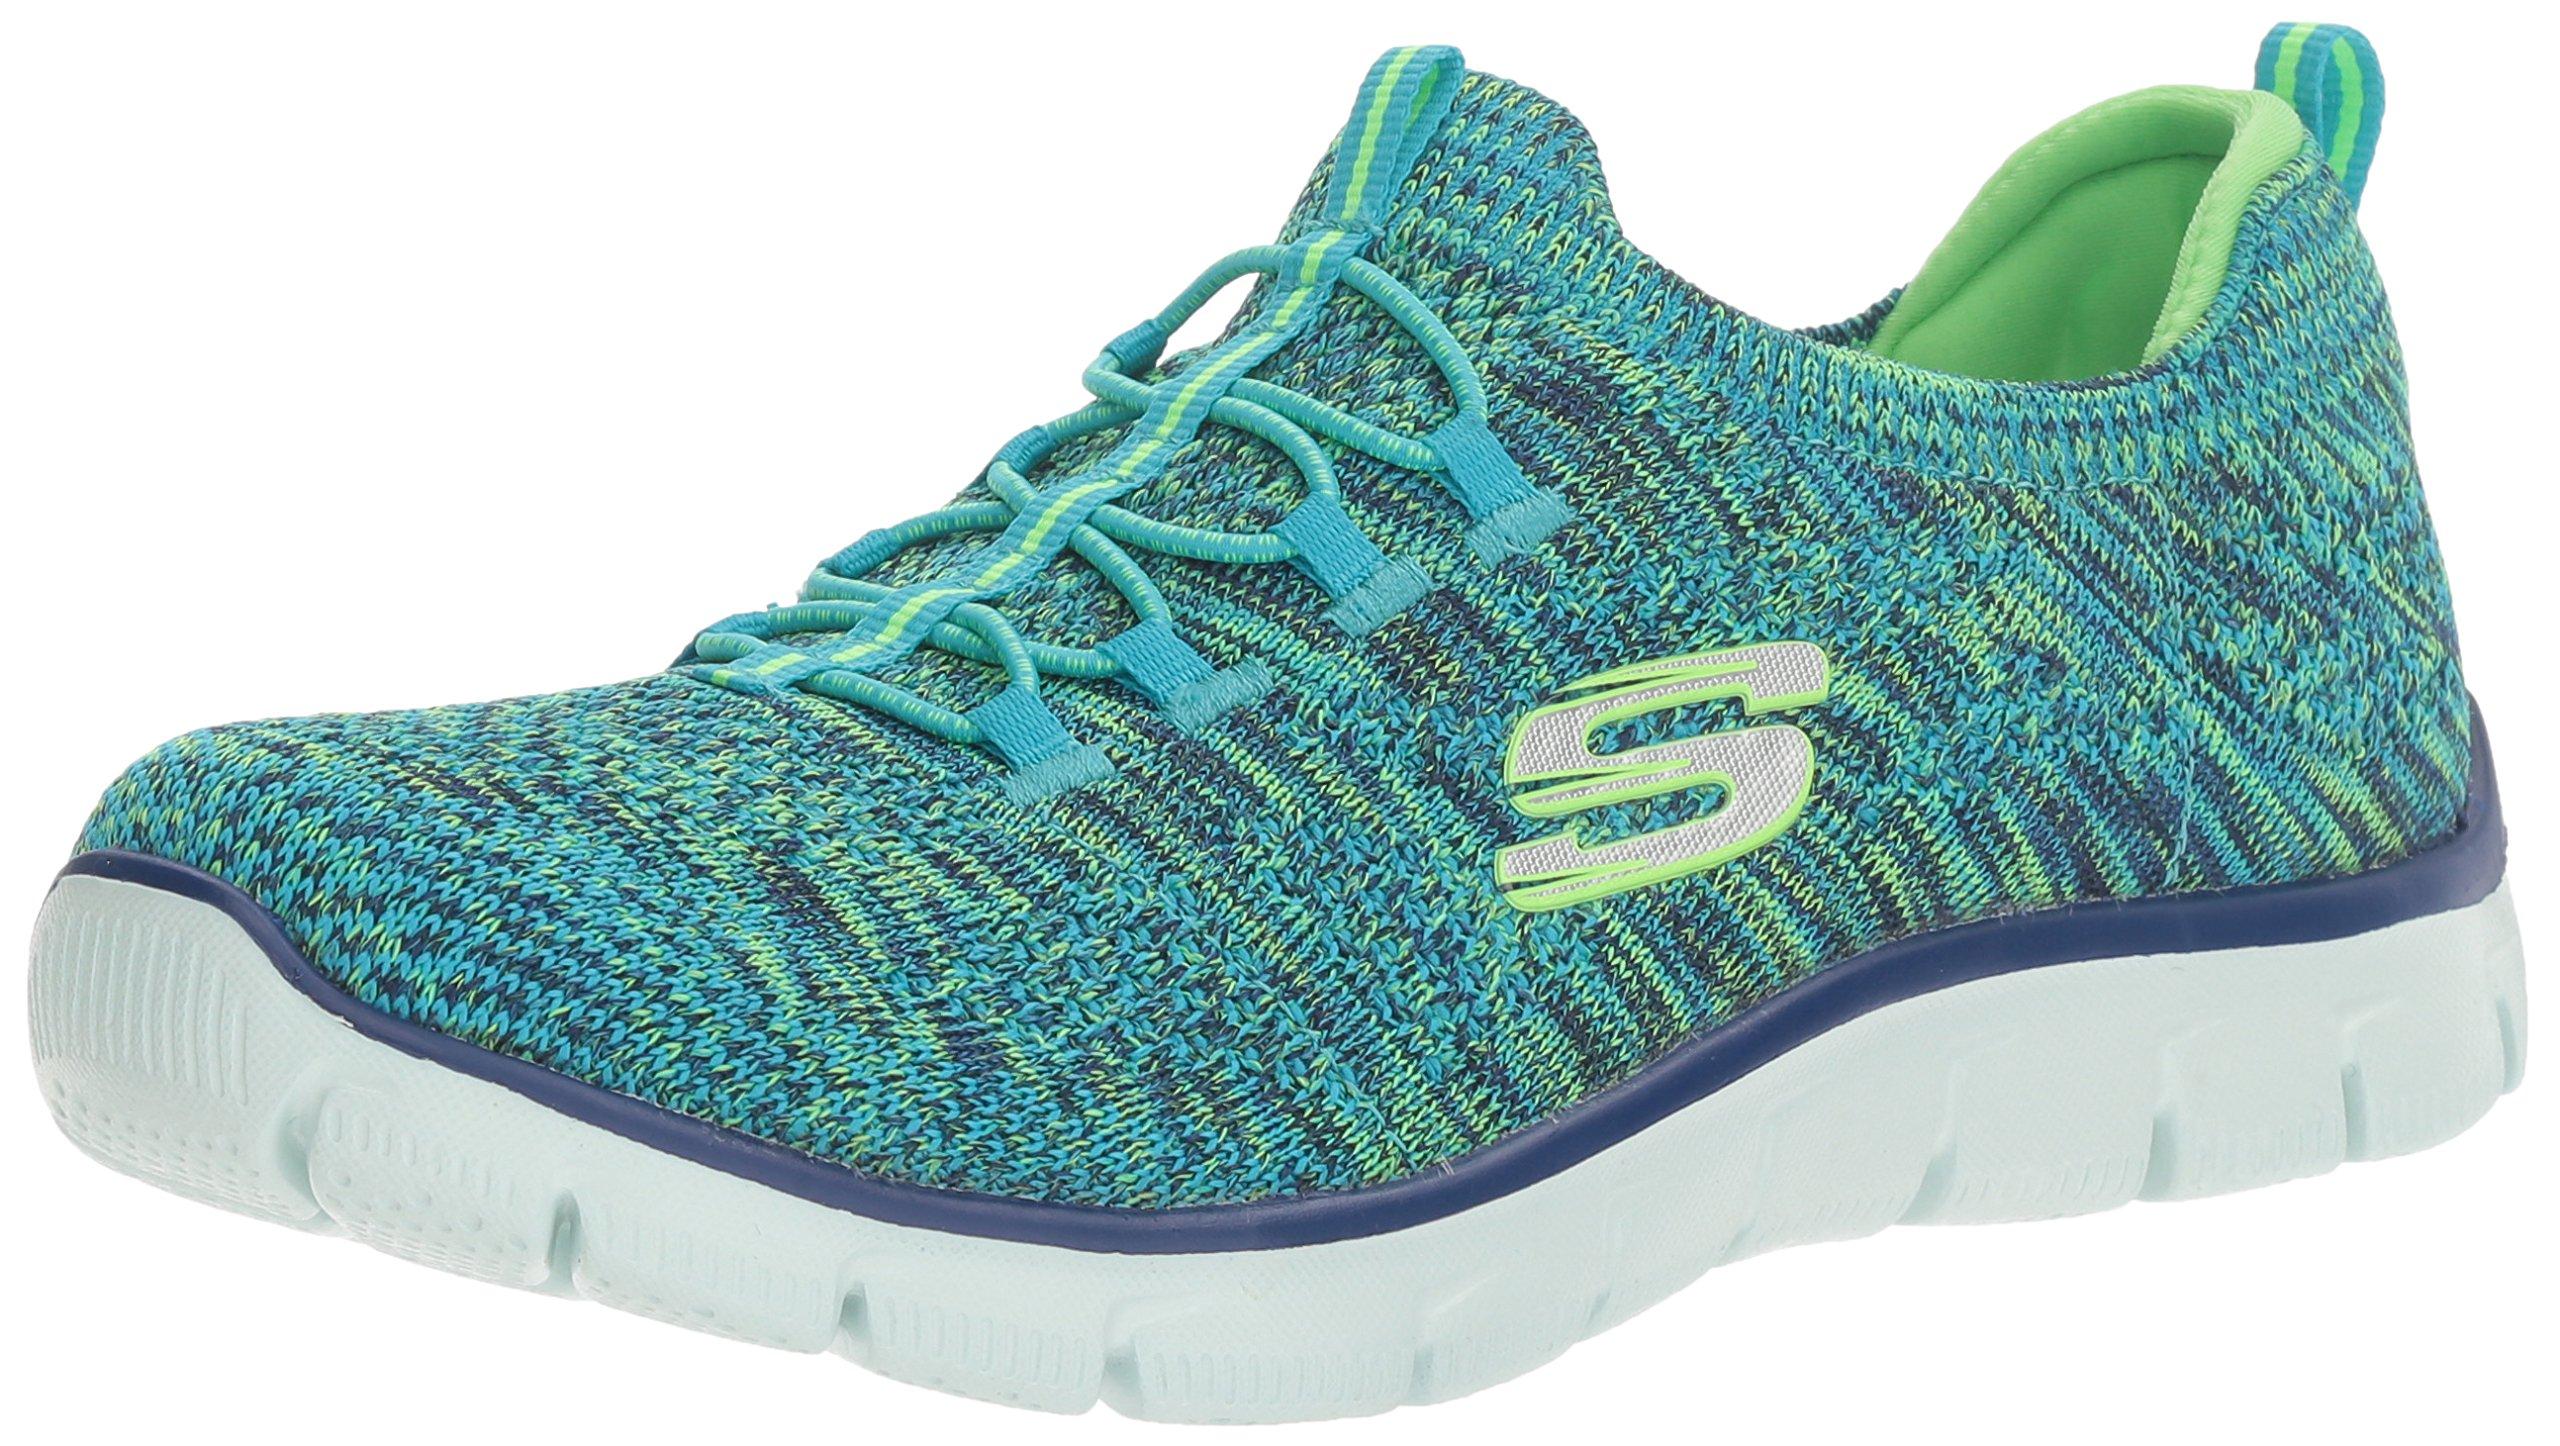 Skechers Sport Women's Empire Sharp Thinking Fashion Sneaker,Blue/Lime,9.5 M US